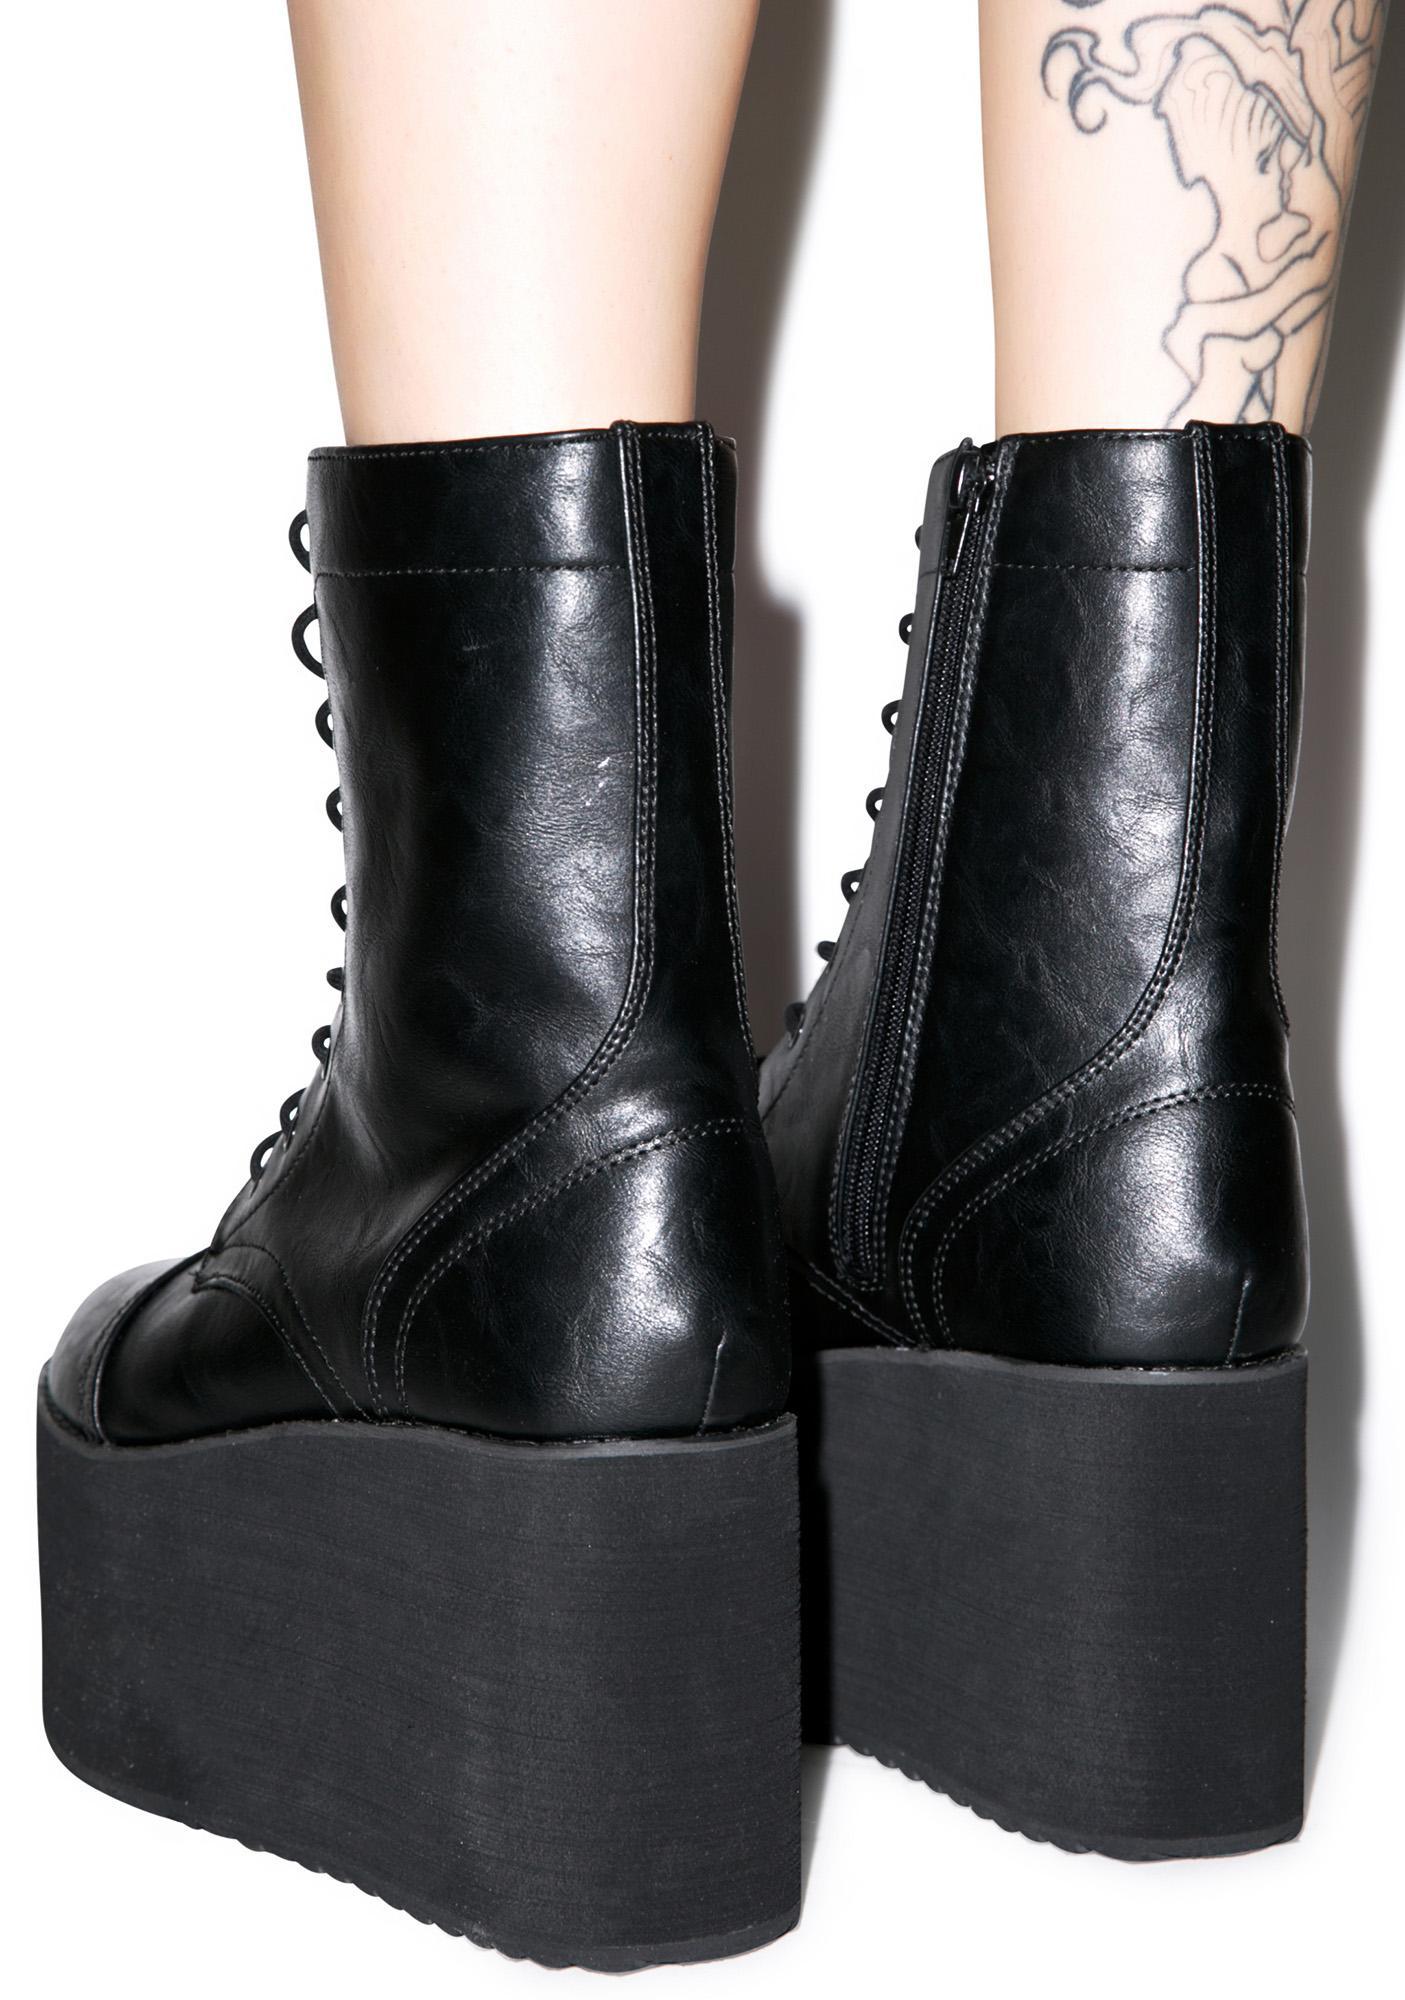 Y.R.U. Tanq Platform Boots